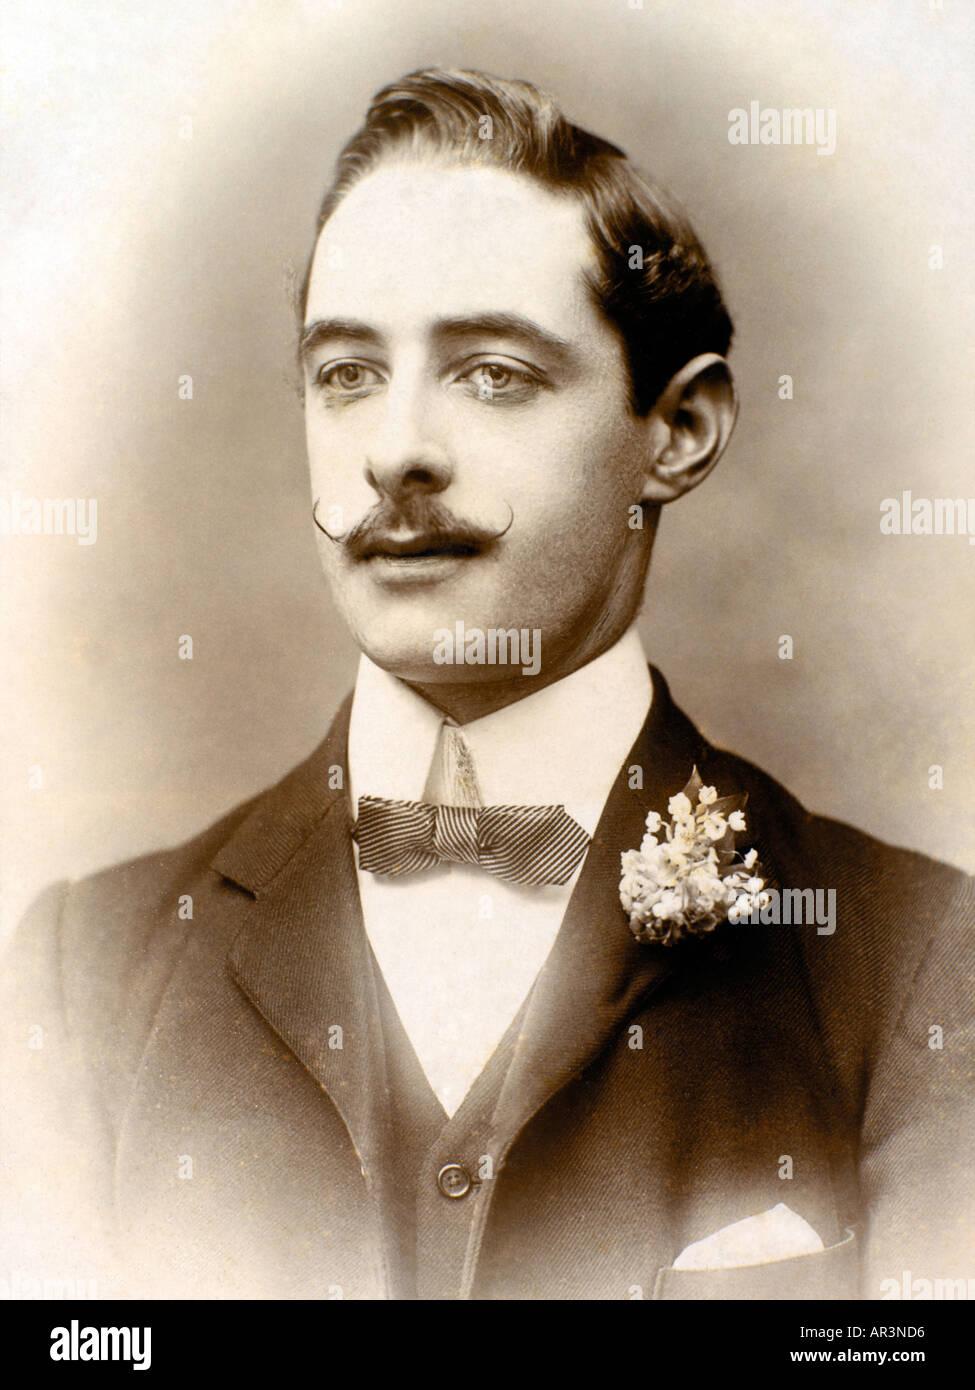 Victorian Gentleman Portrait Old Photograph Stock Photo